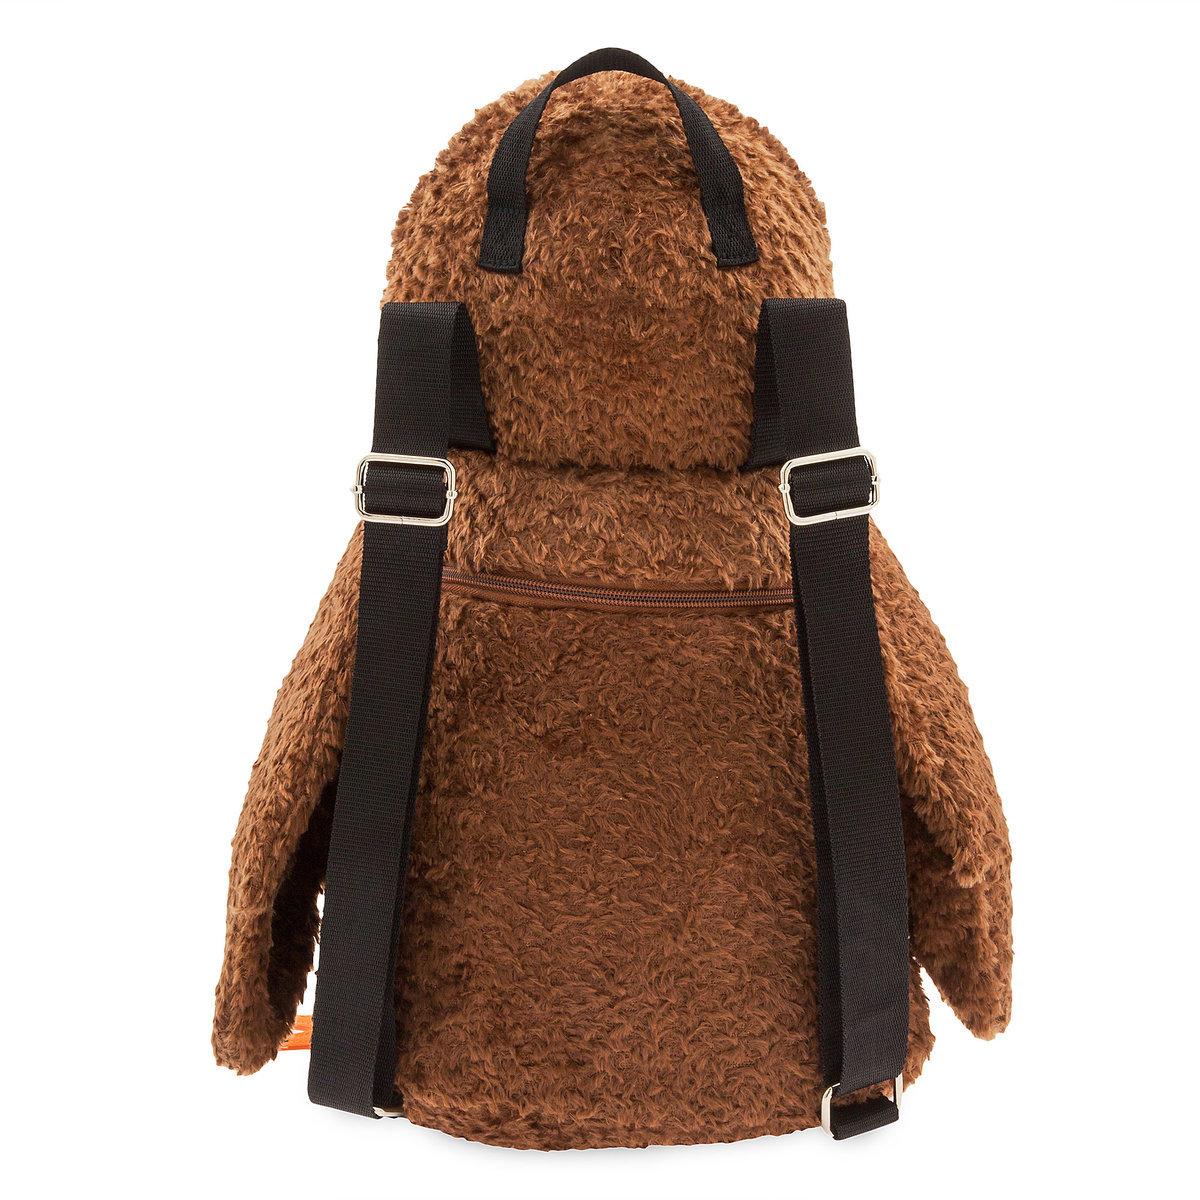 TLJ Porg Backpack 2